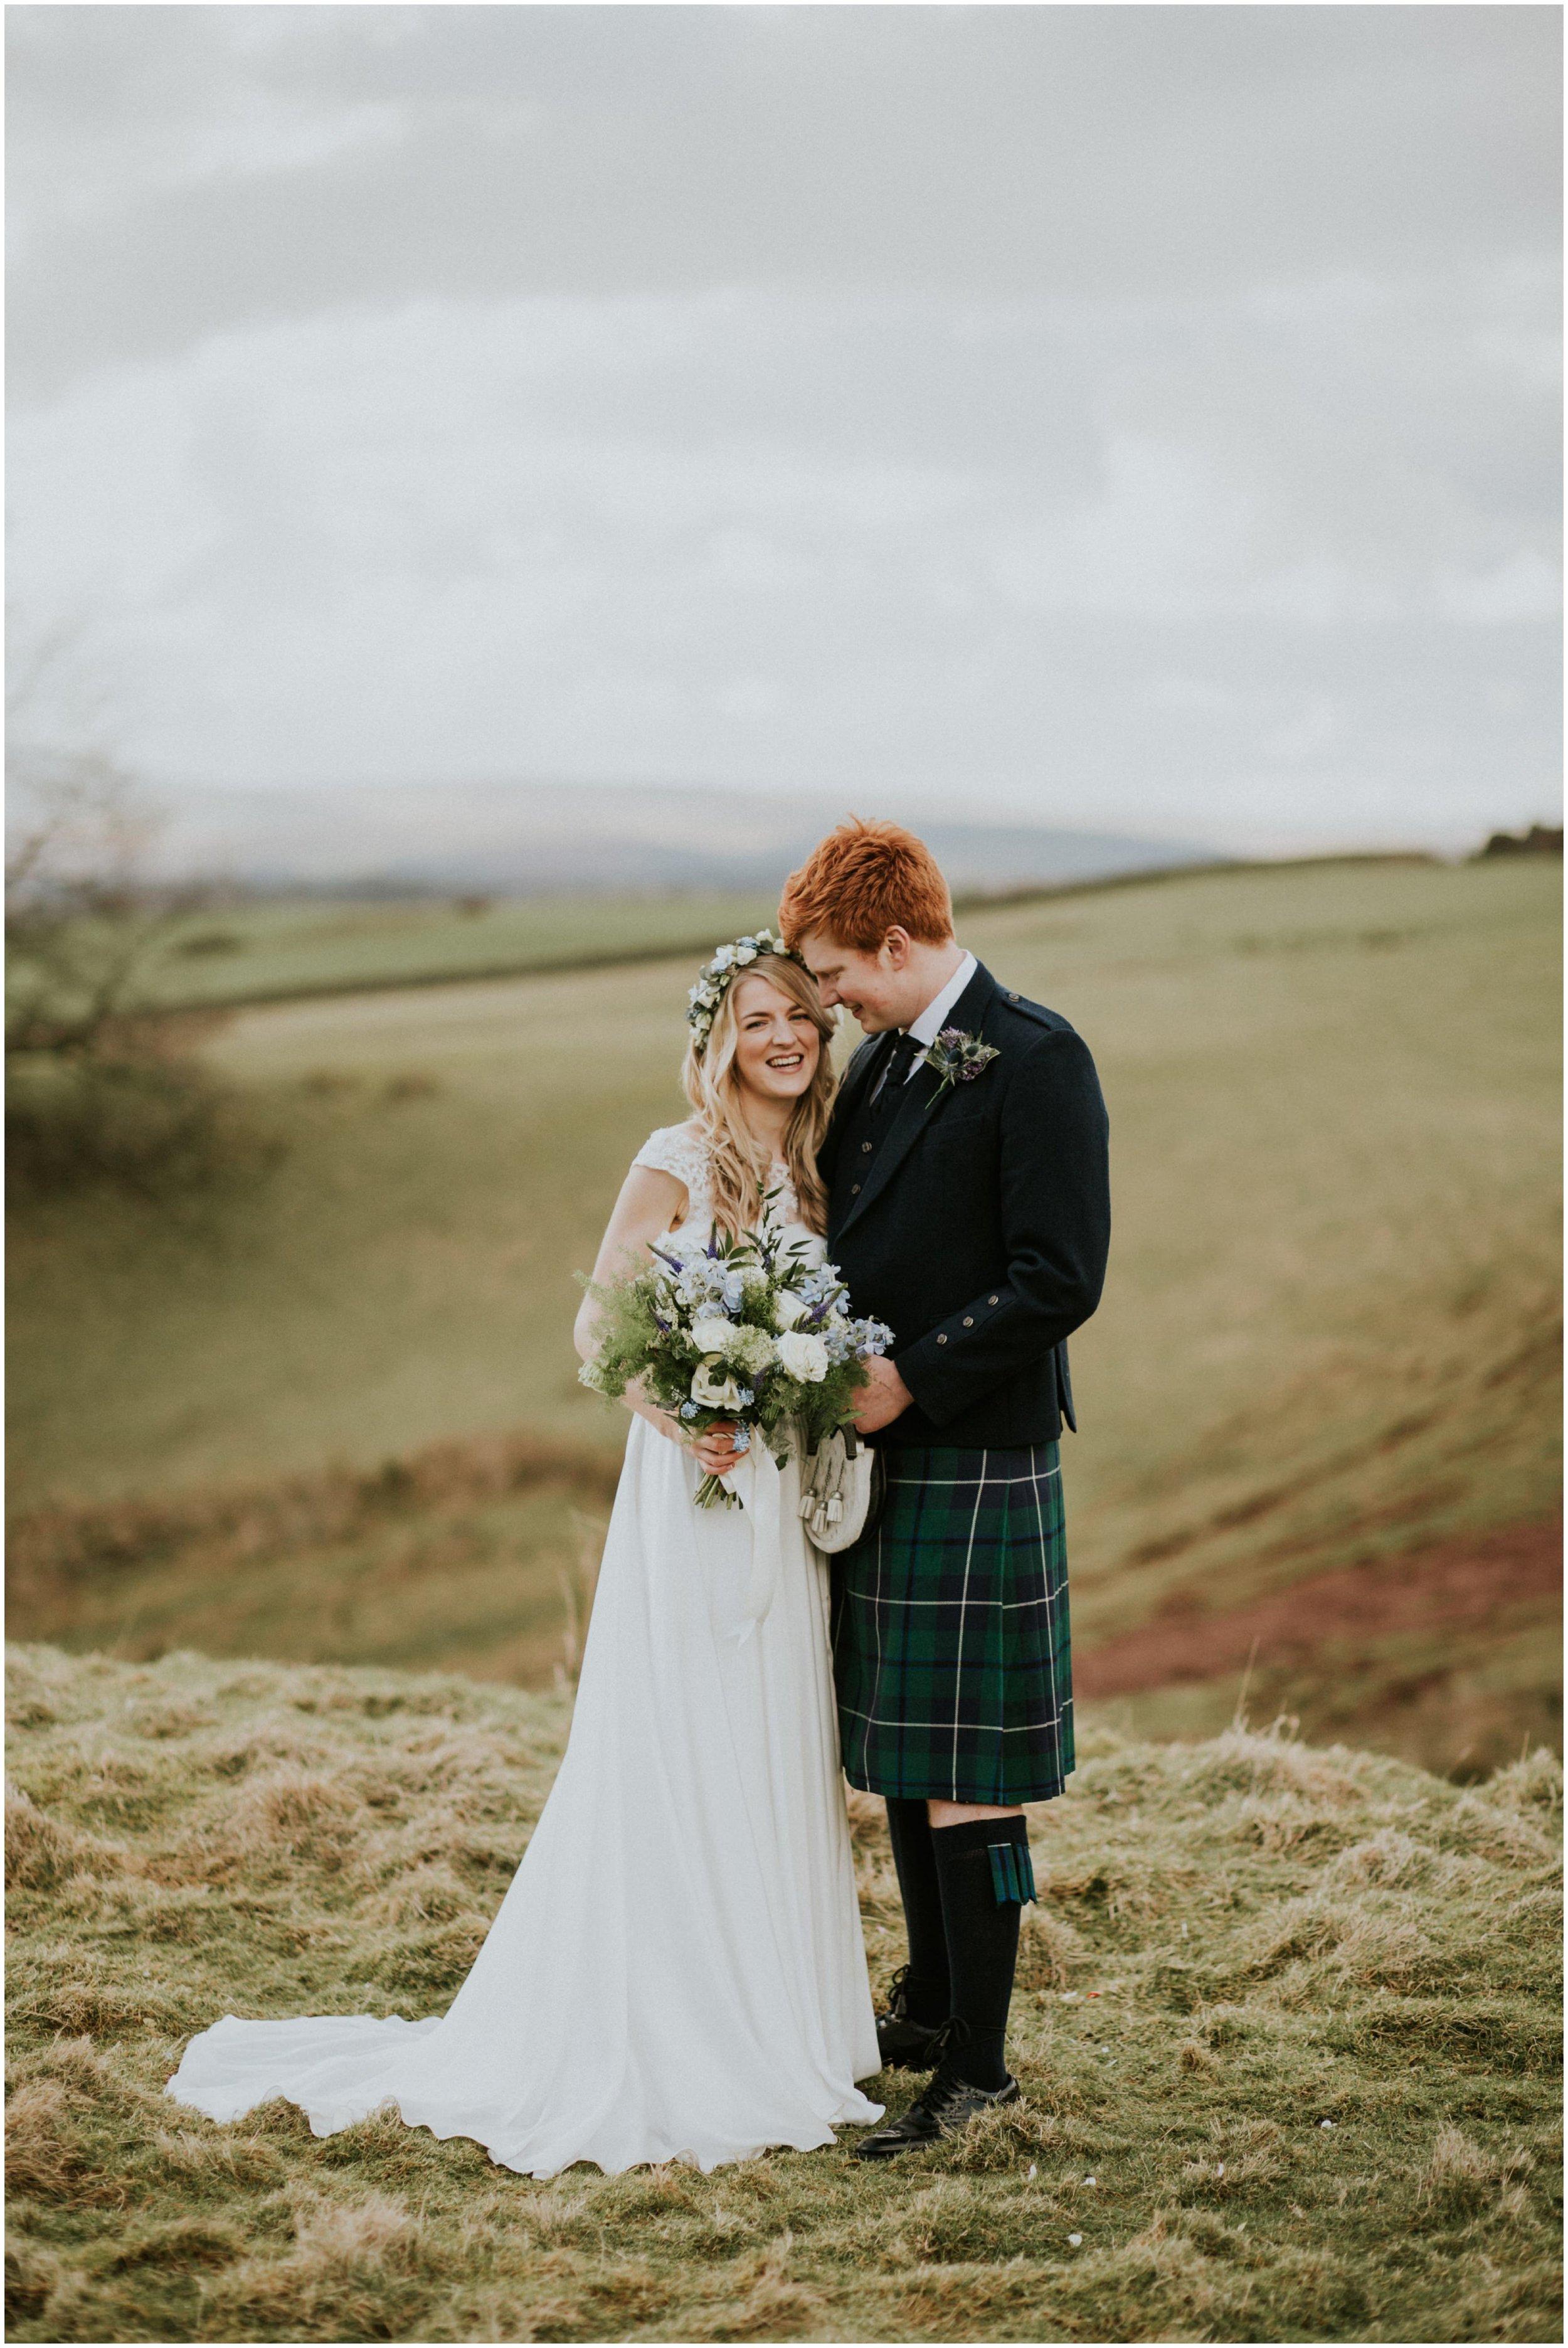 Photography 78 - Glasgow Wedding Photographer - Dave & Alana_0061.jpg